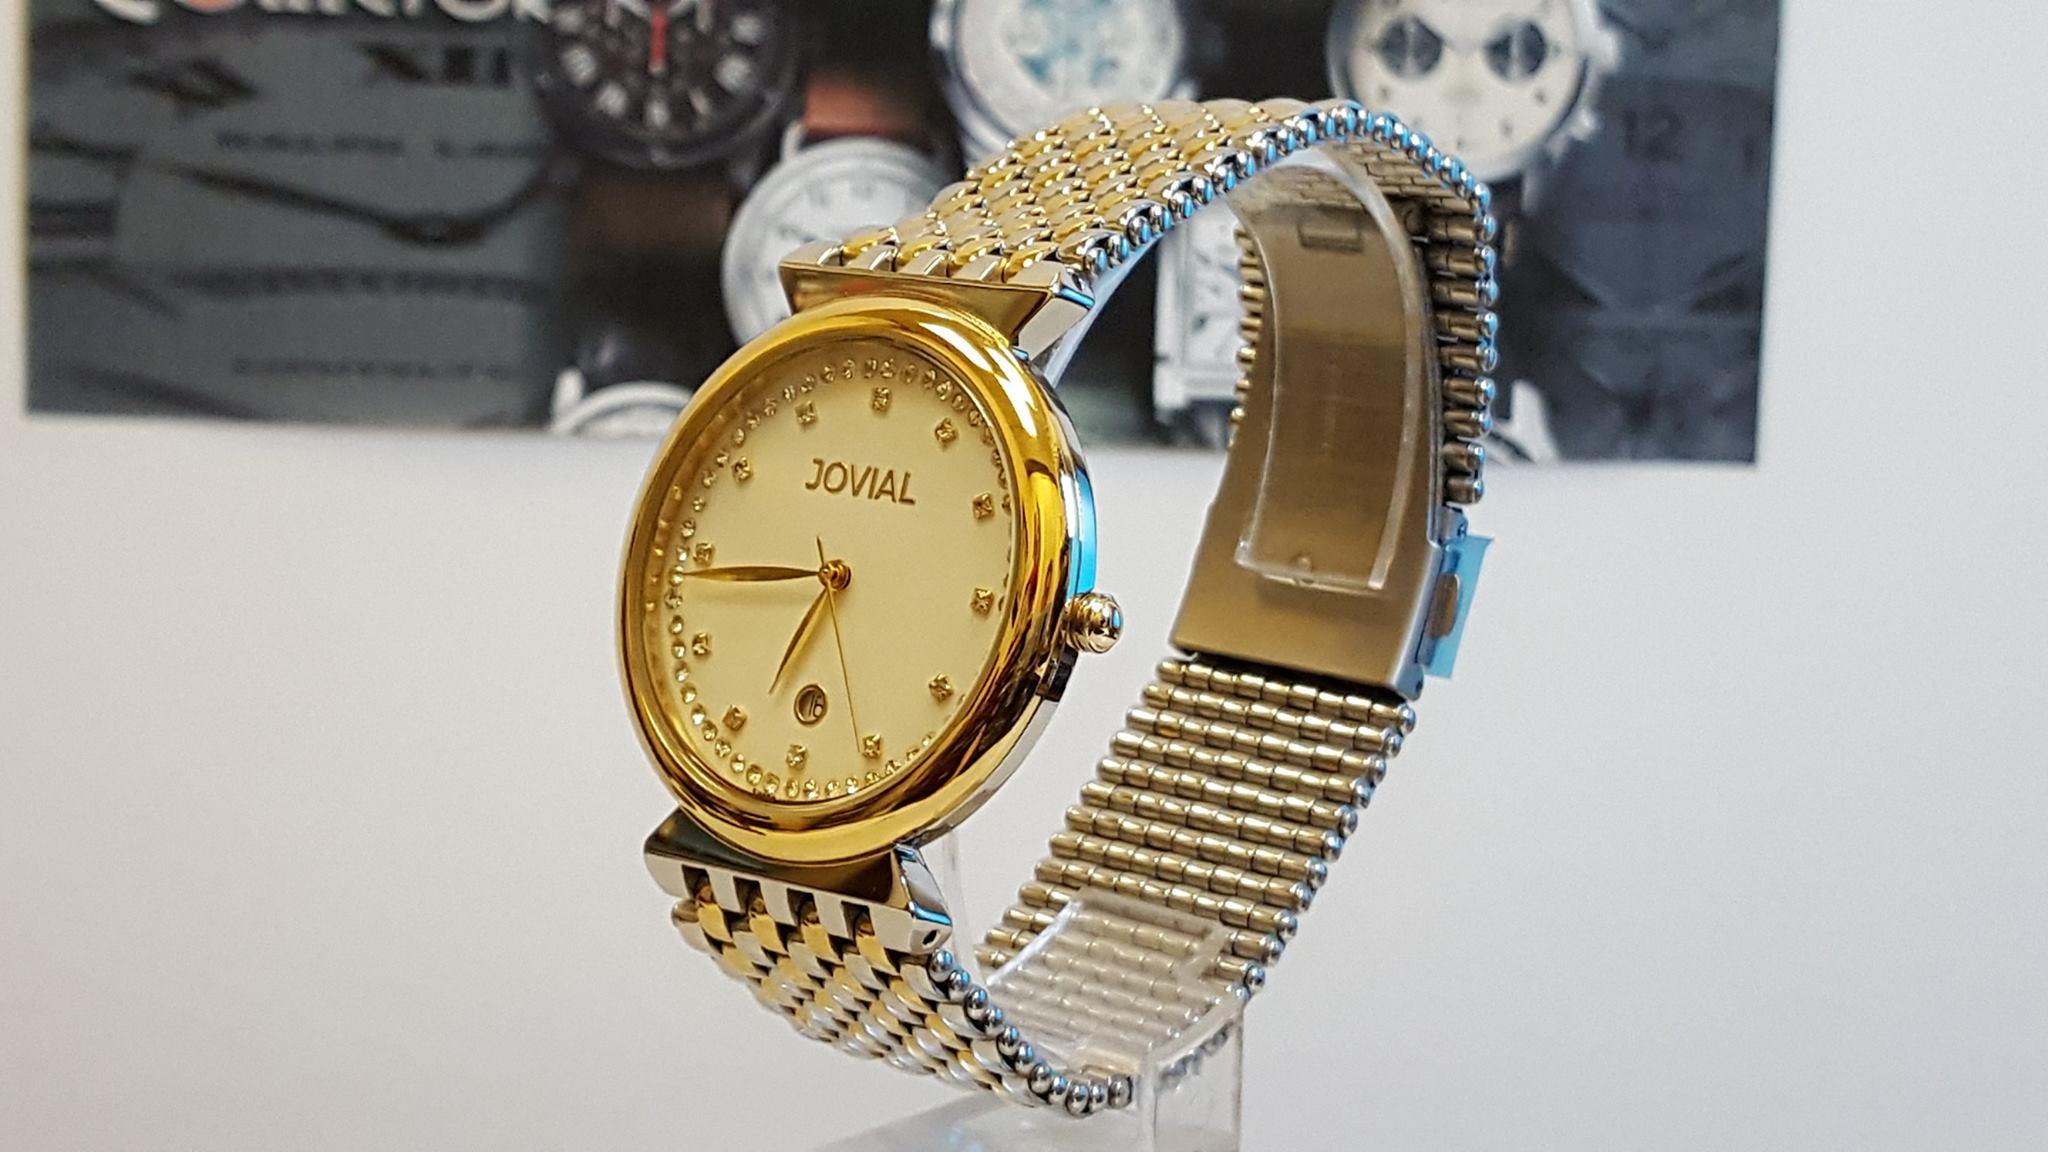 Jovial Gold mesh bracelet